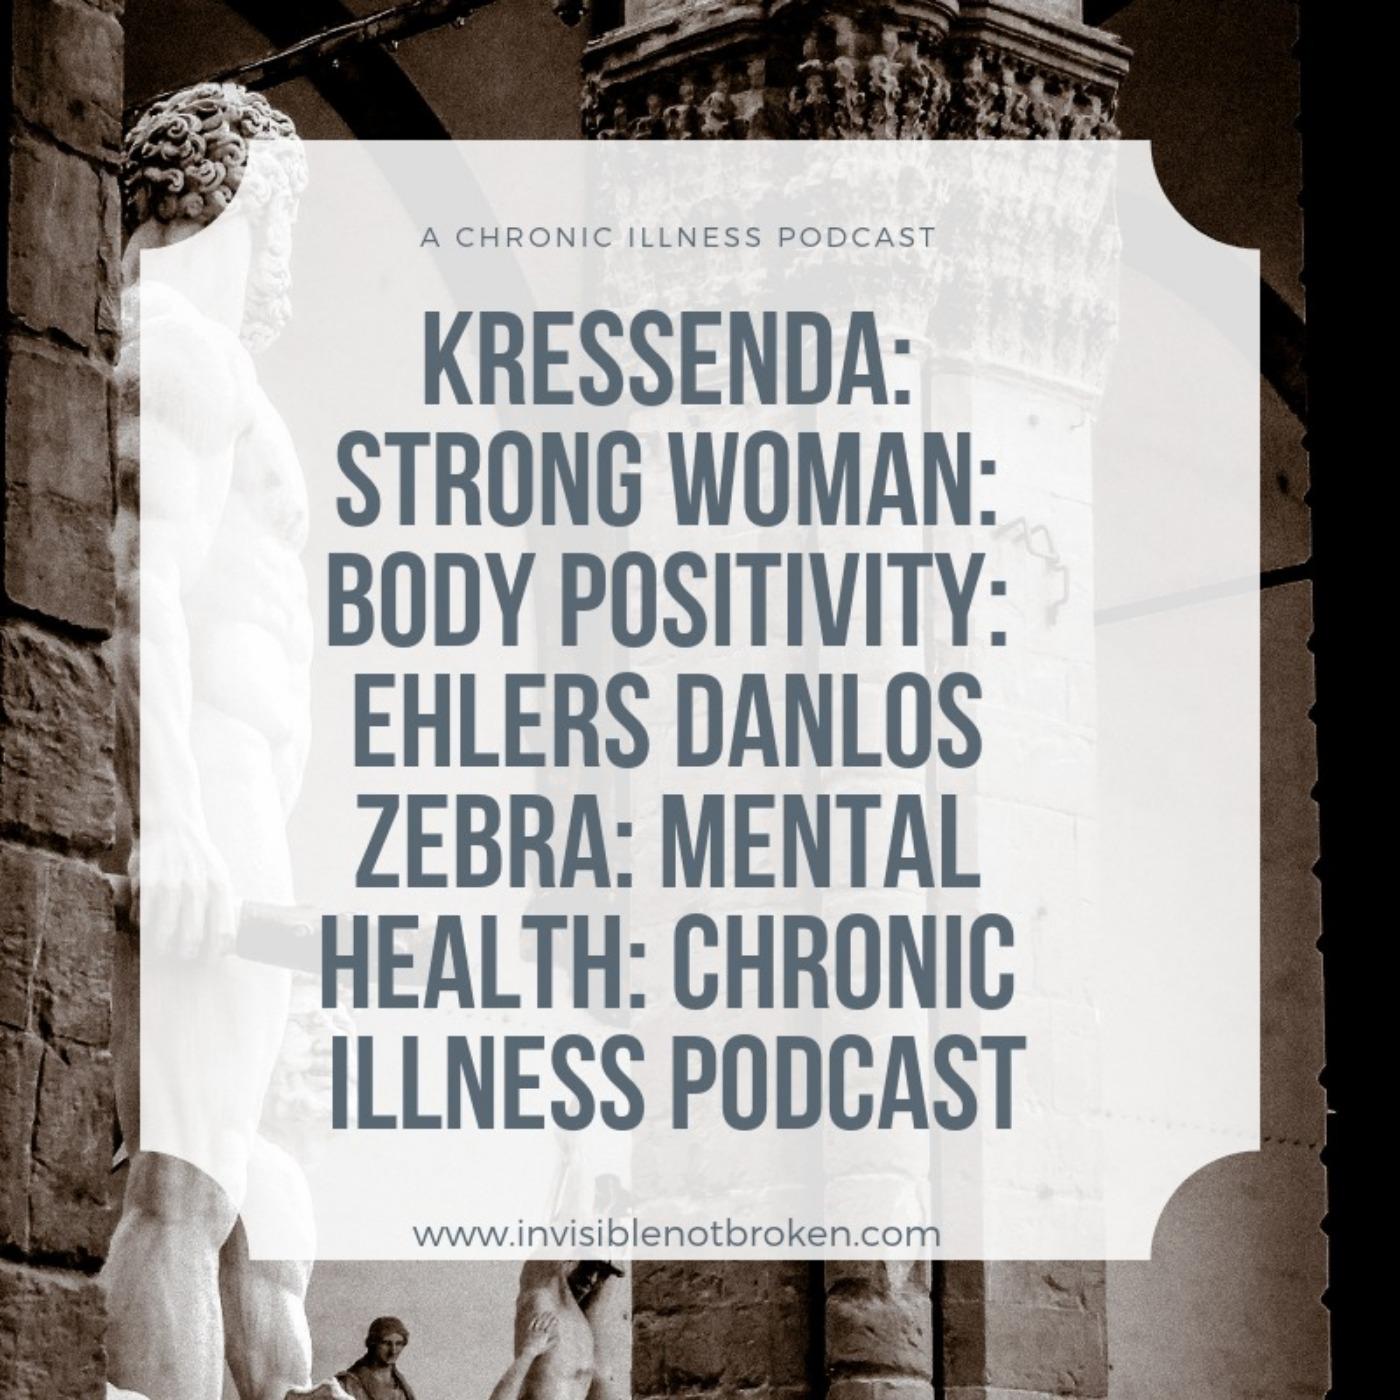 Invisible Not Broken Chronic Illness Podcast   Podbay